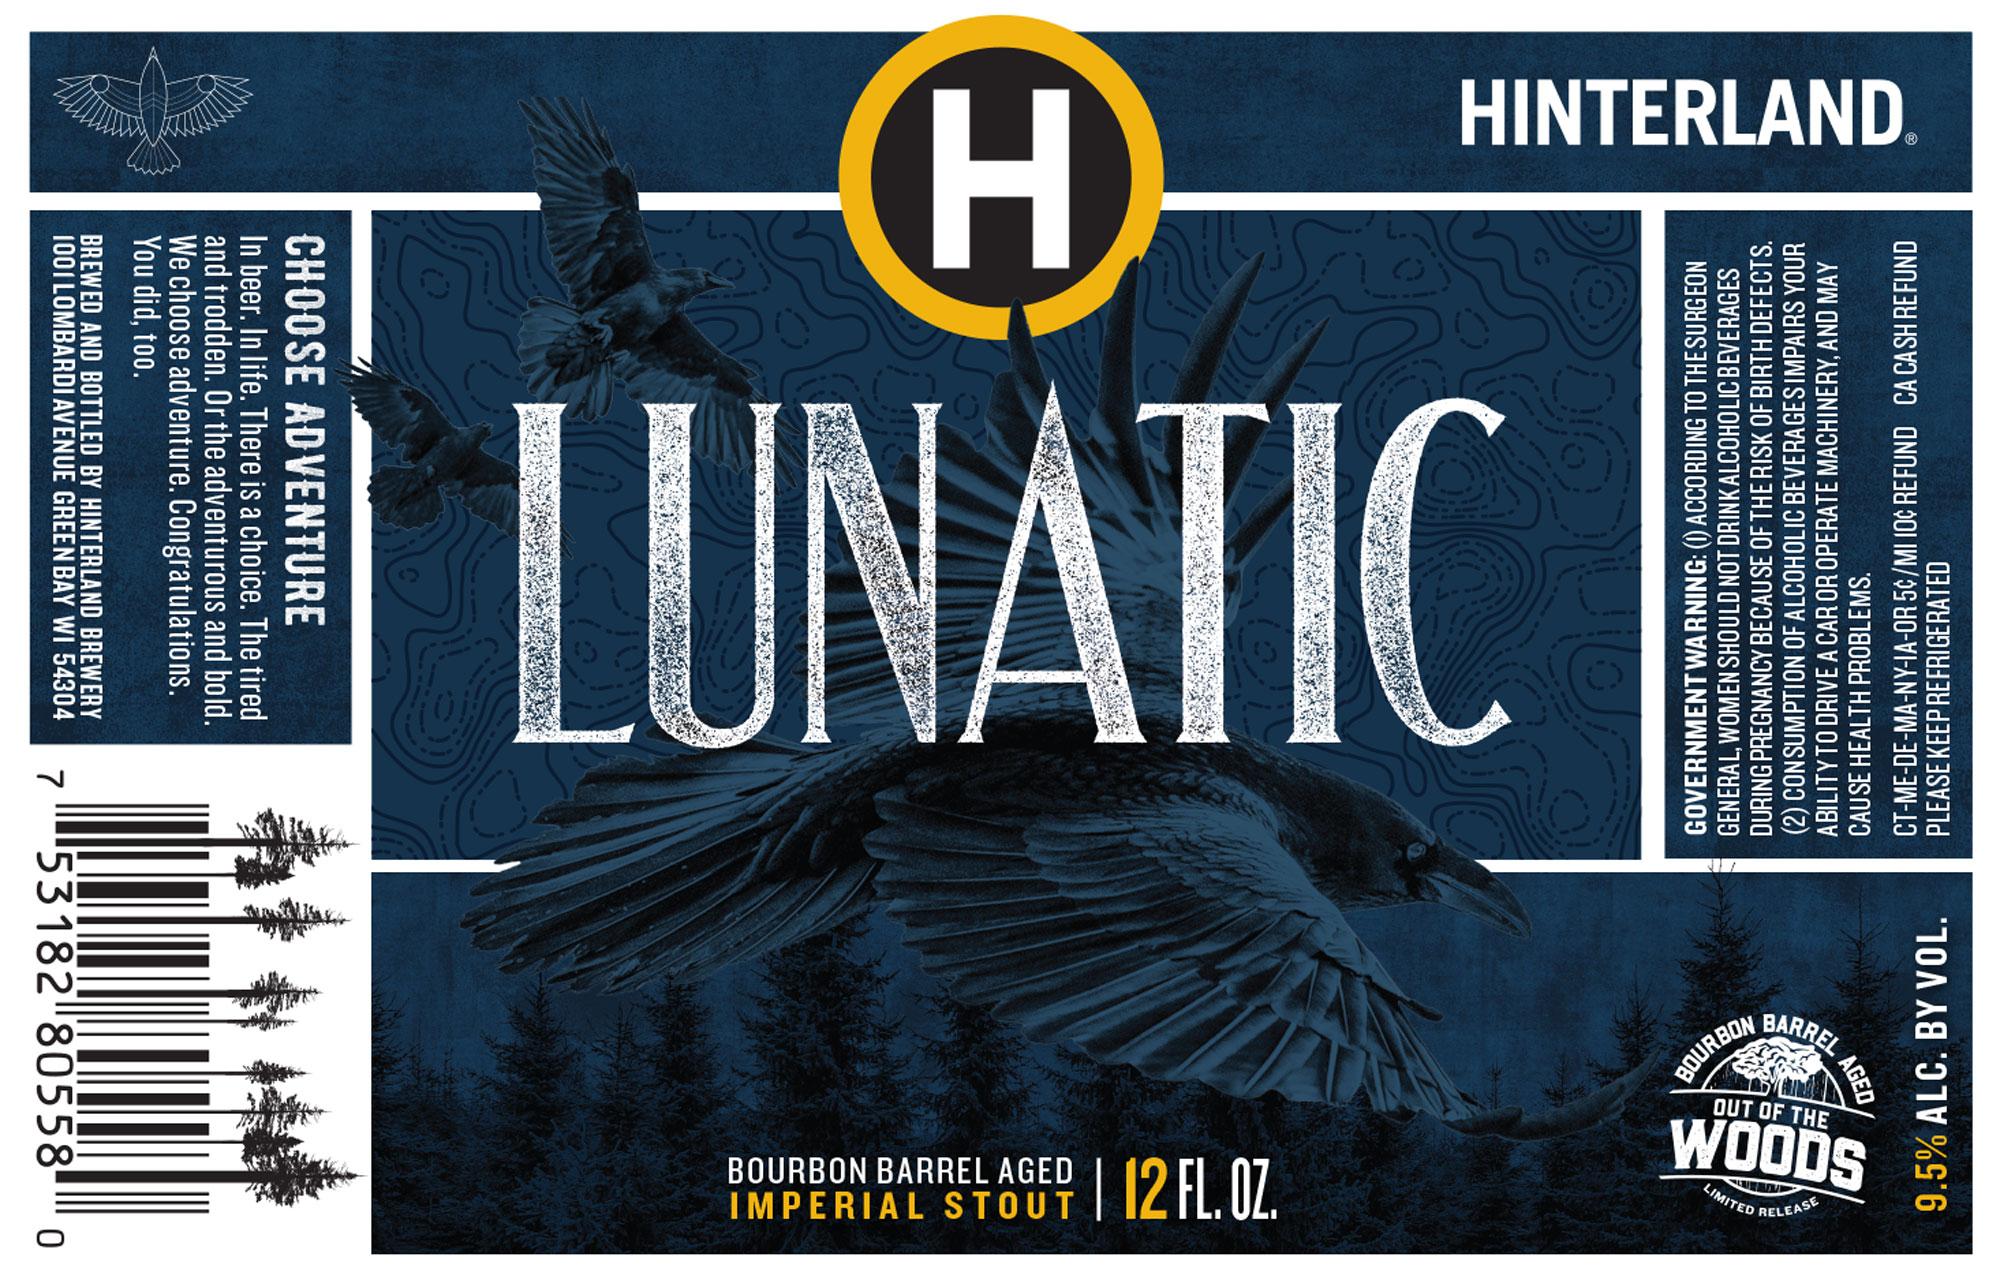 HINTR_Lunatic_Label_v0r4.jpg